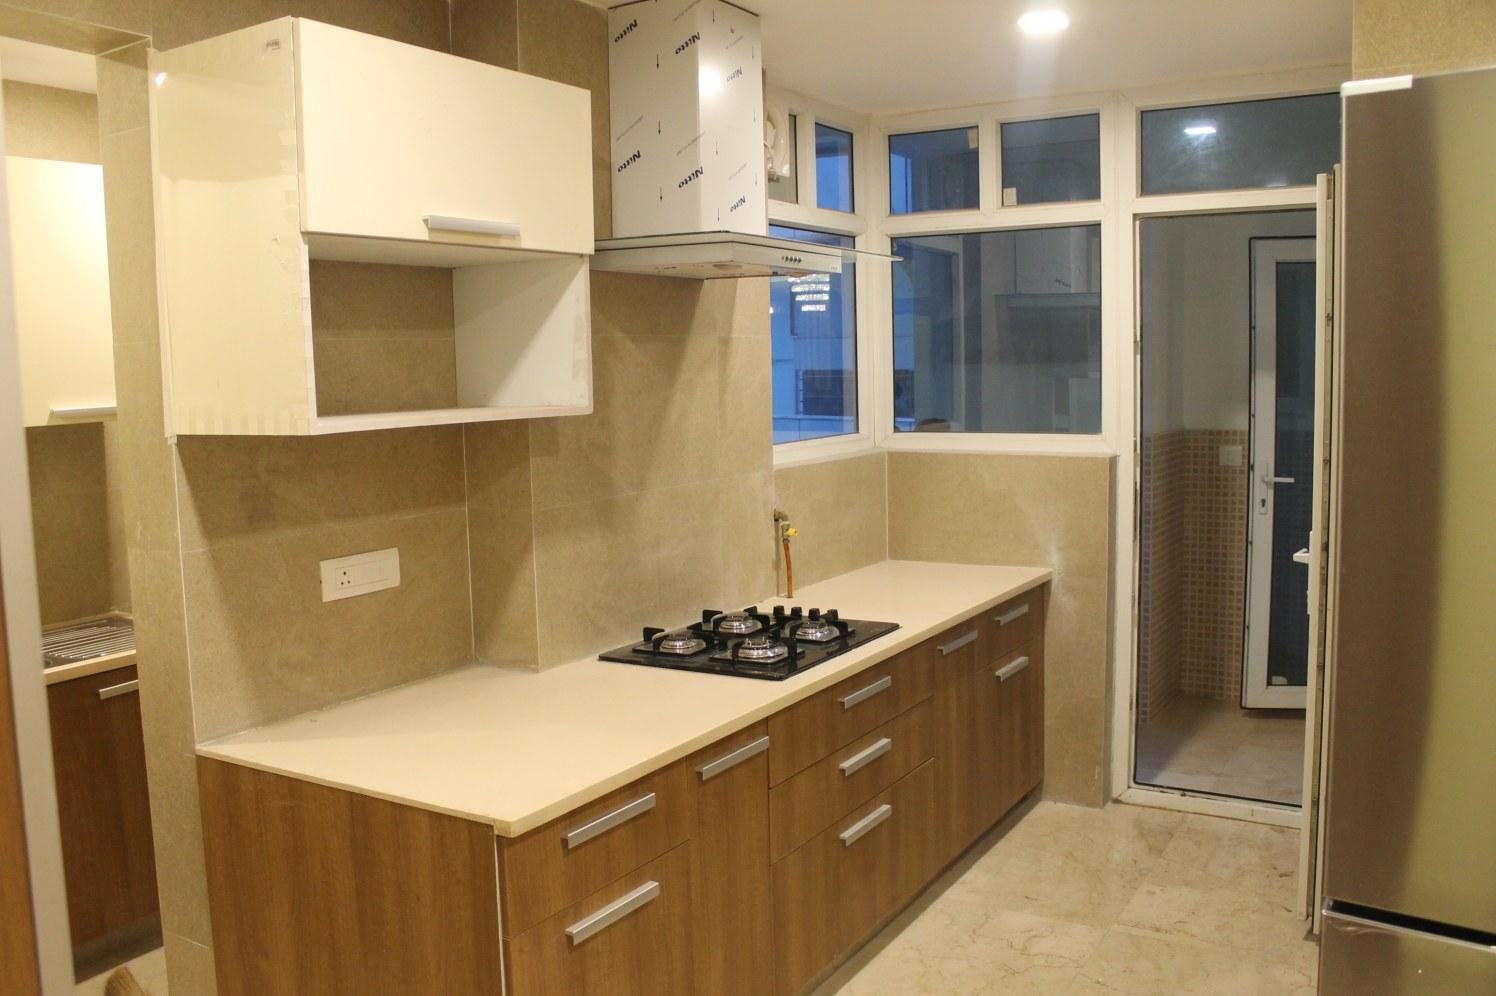 Simple modular kitchen by coalitiondesigns Modular-kitchen Modern | Interior Design Photos & Ideas